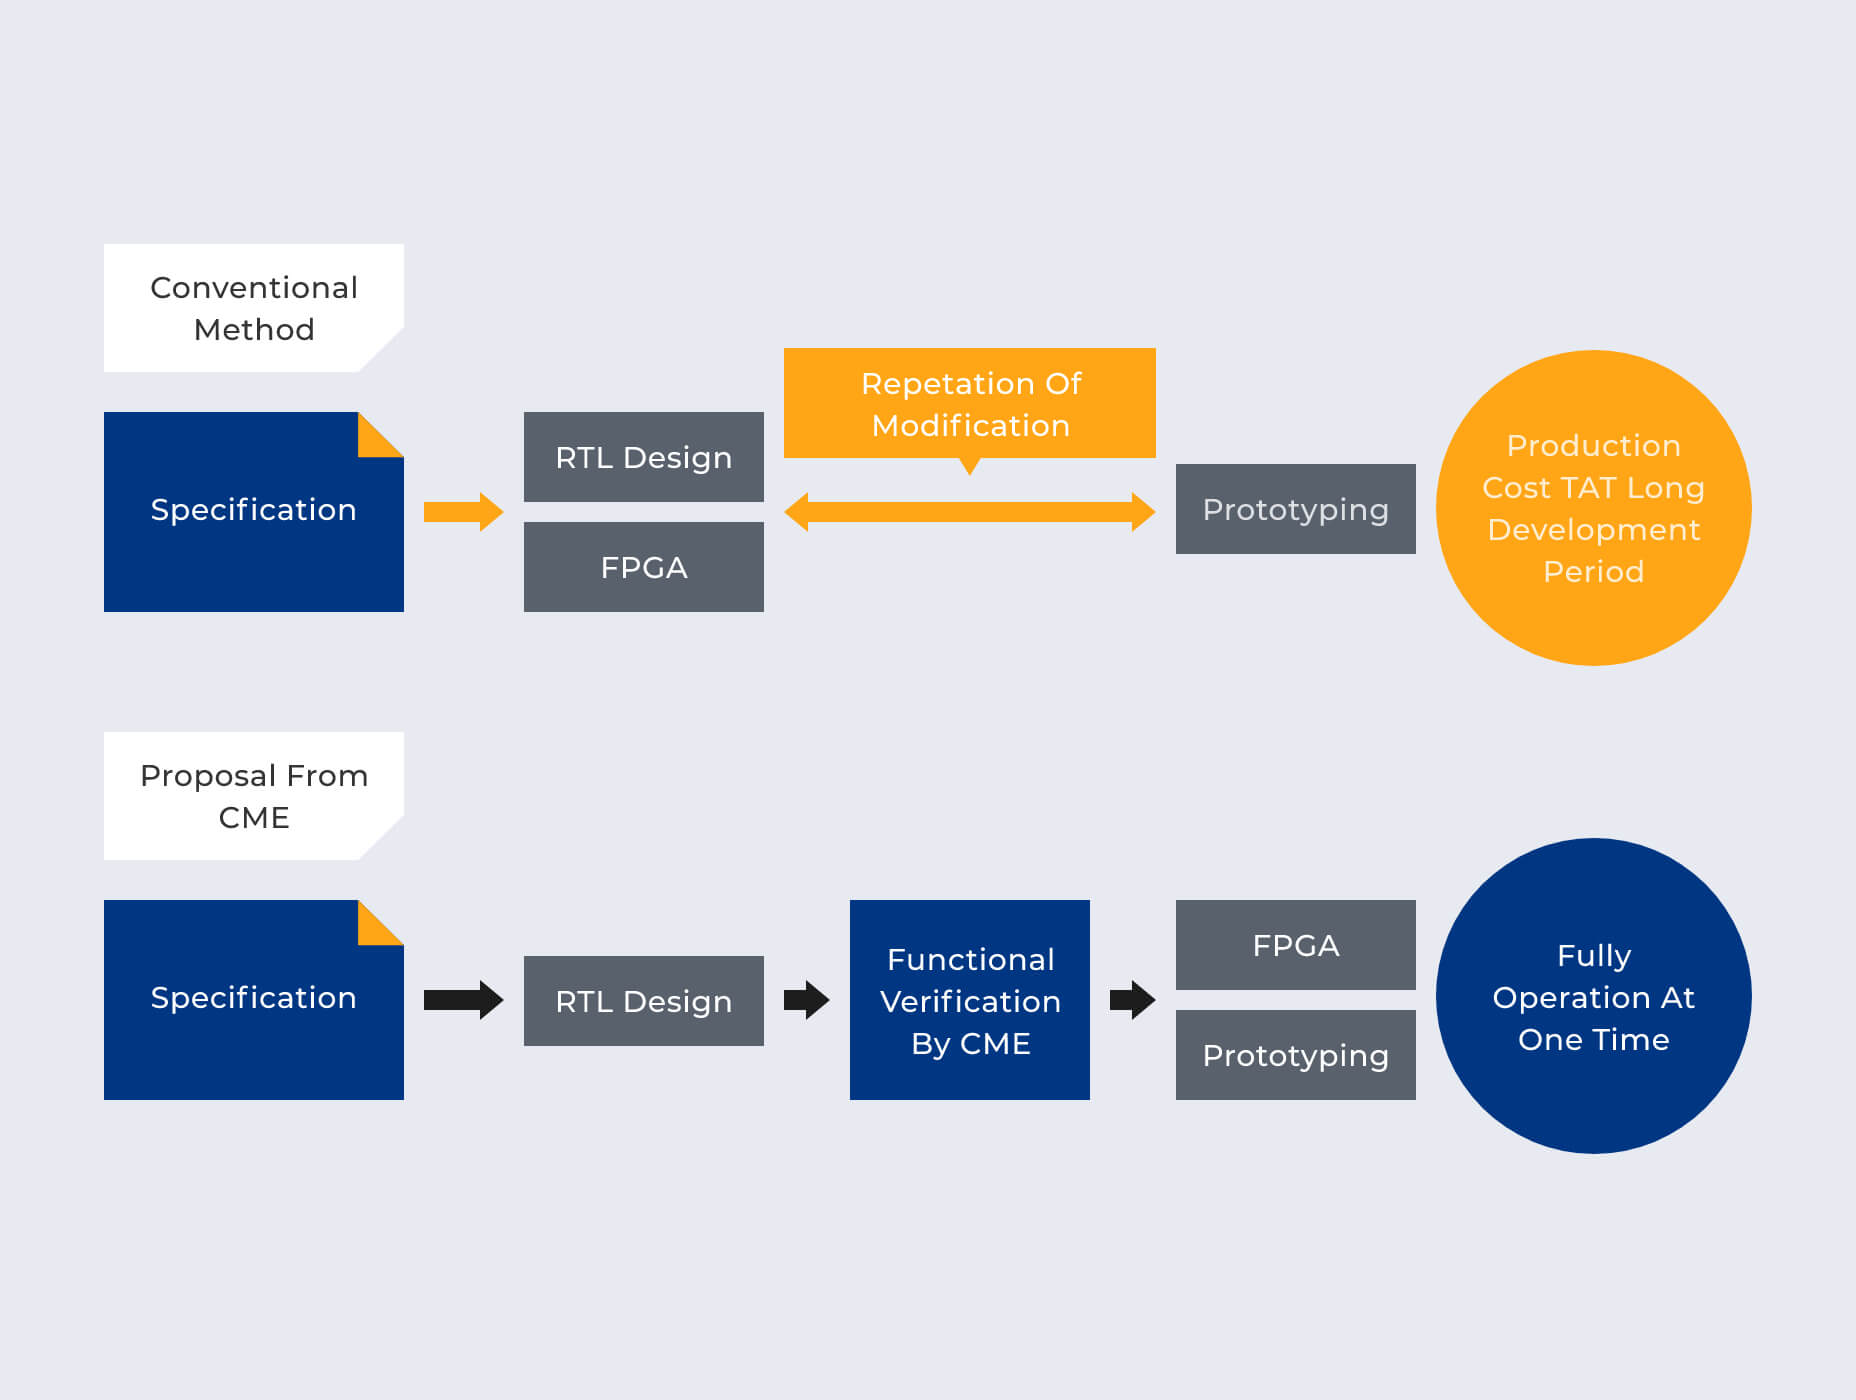 FPGA Verification Services